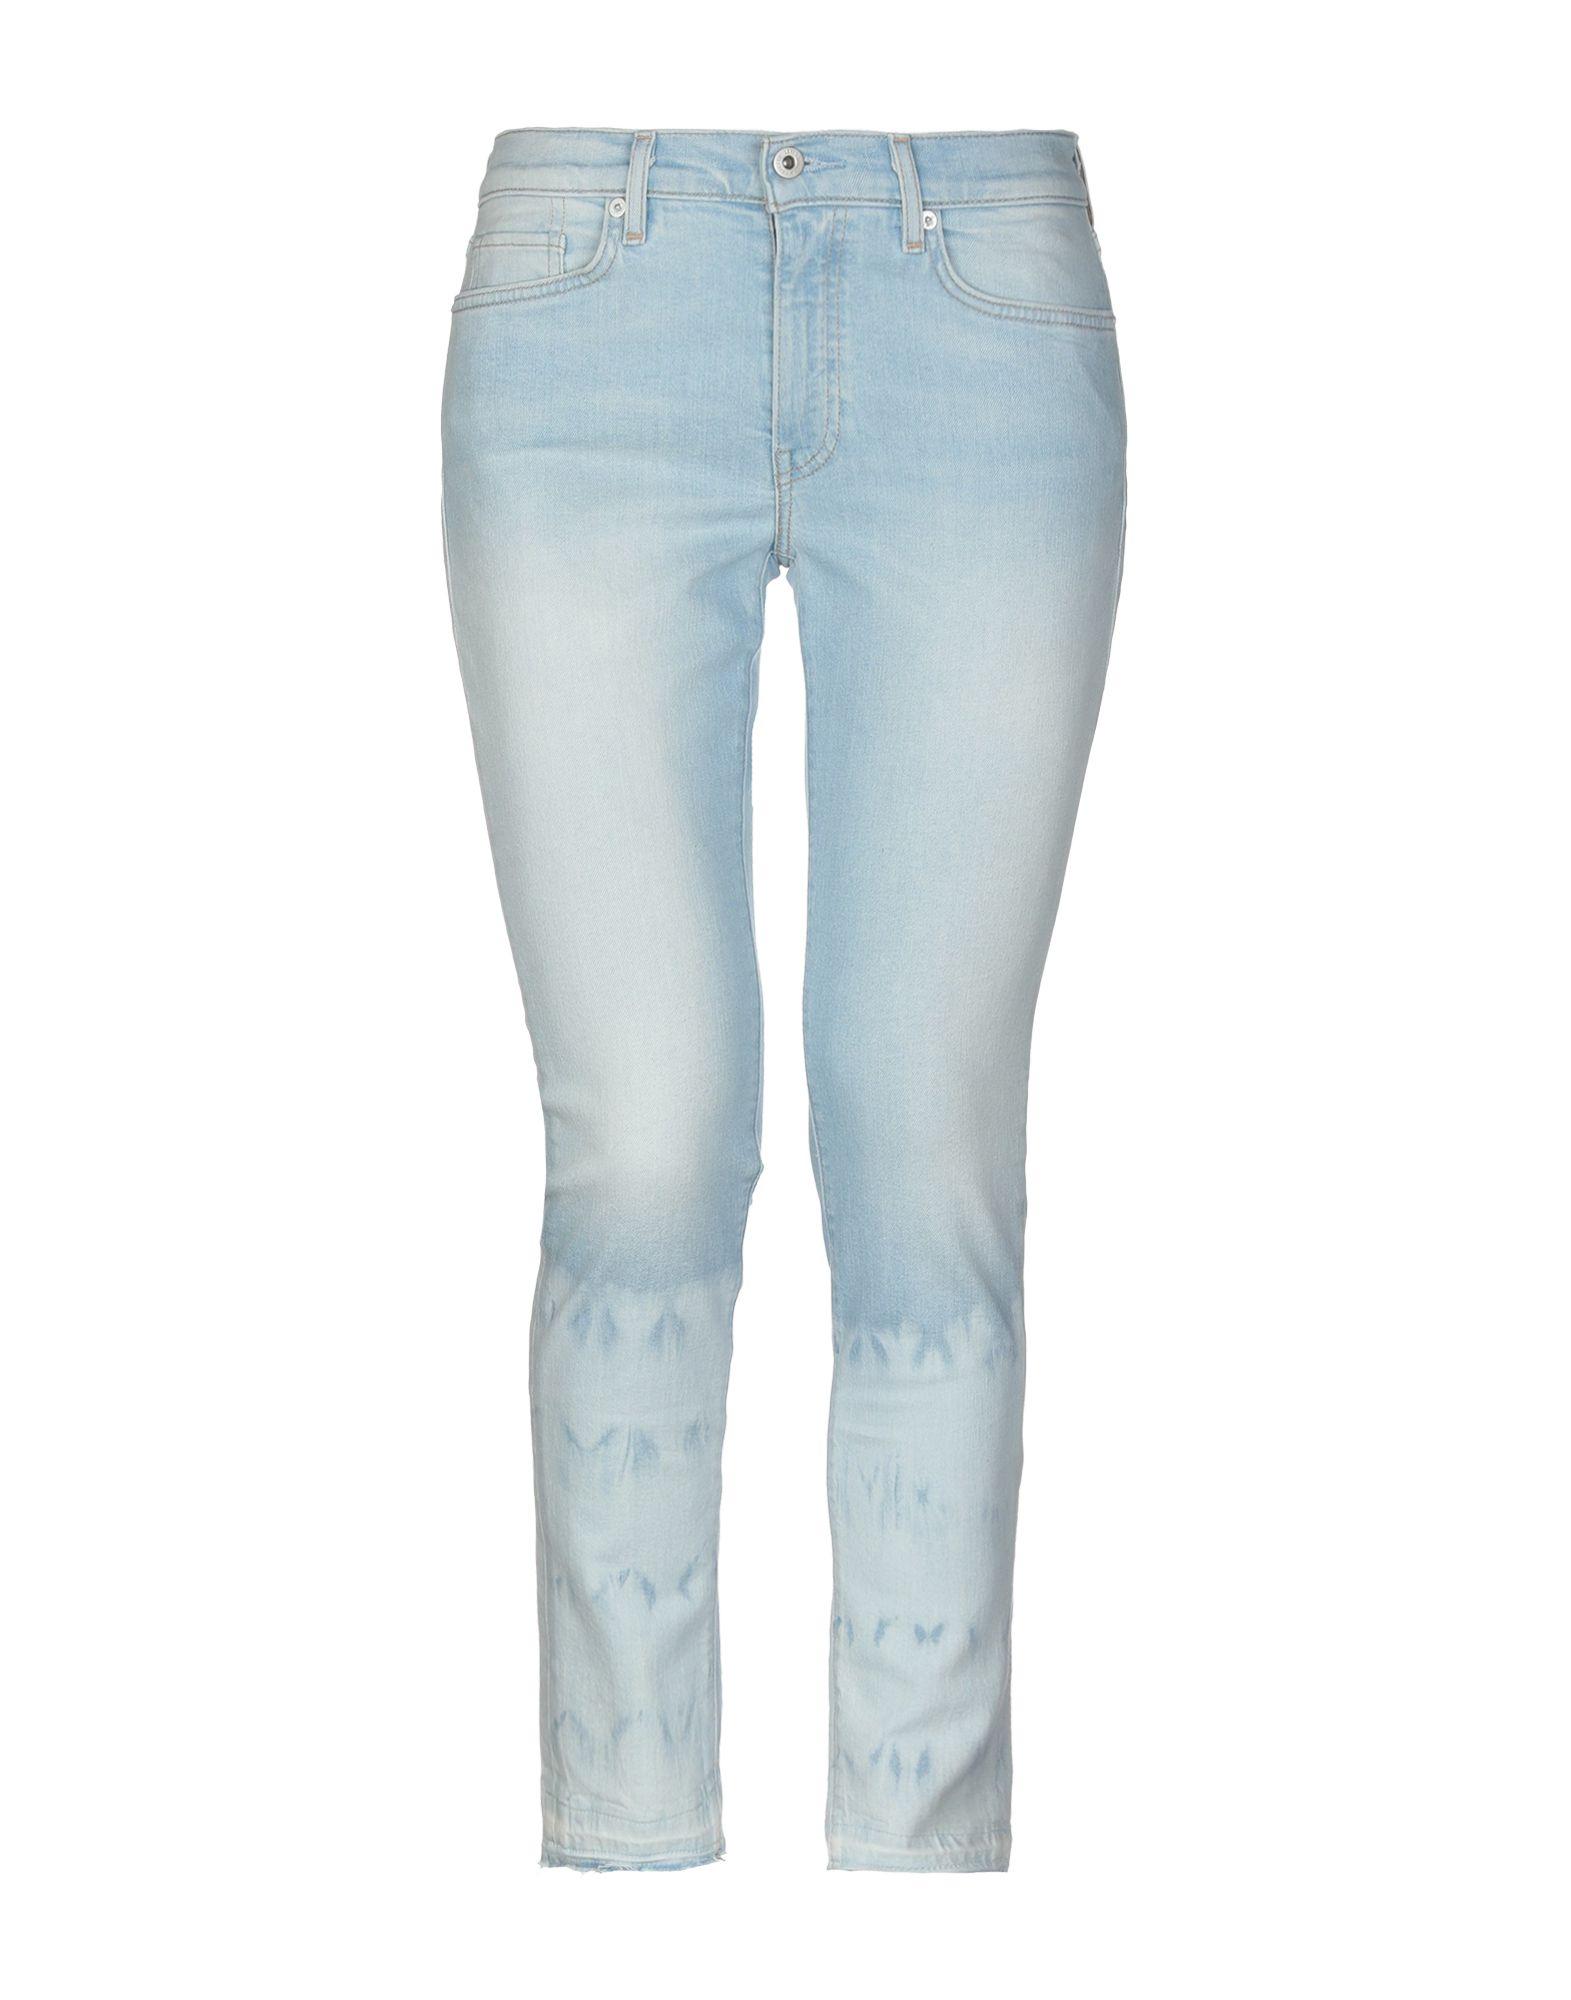 LEVI'S MADE & CRAFTED Джинсовые брюки